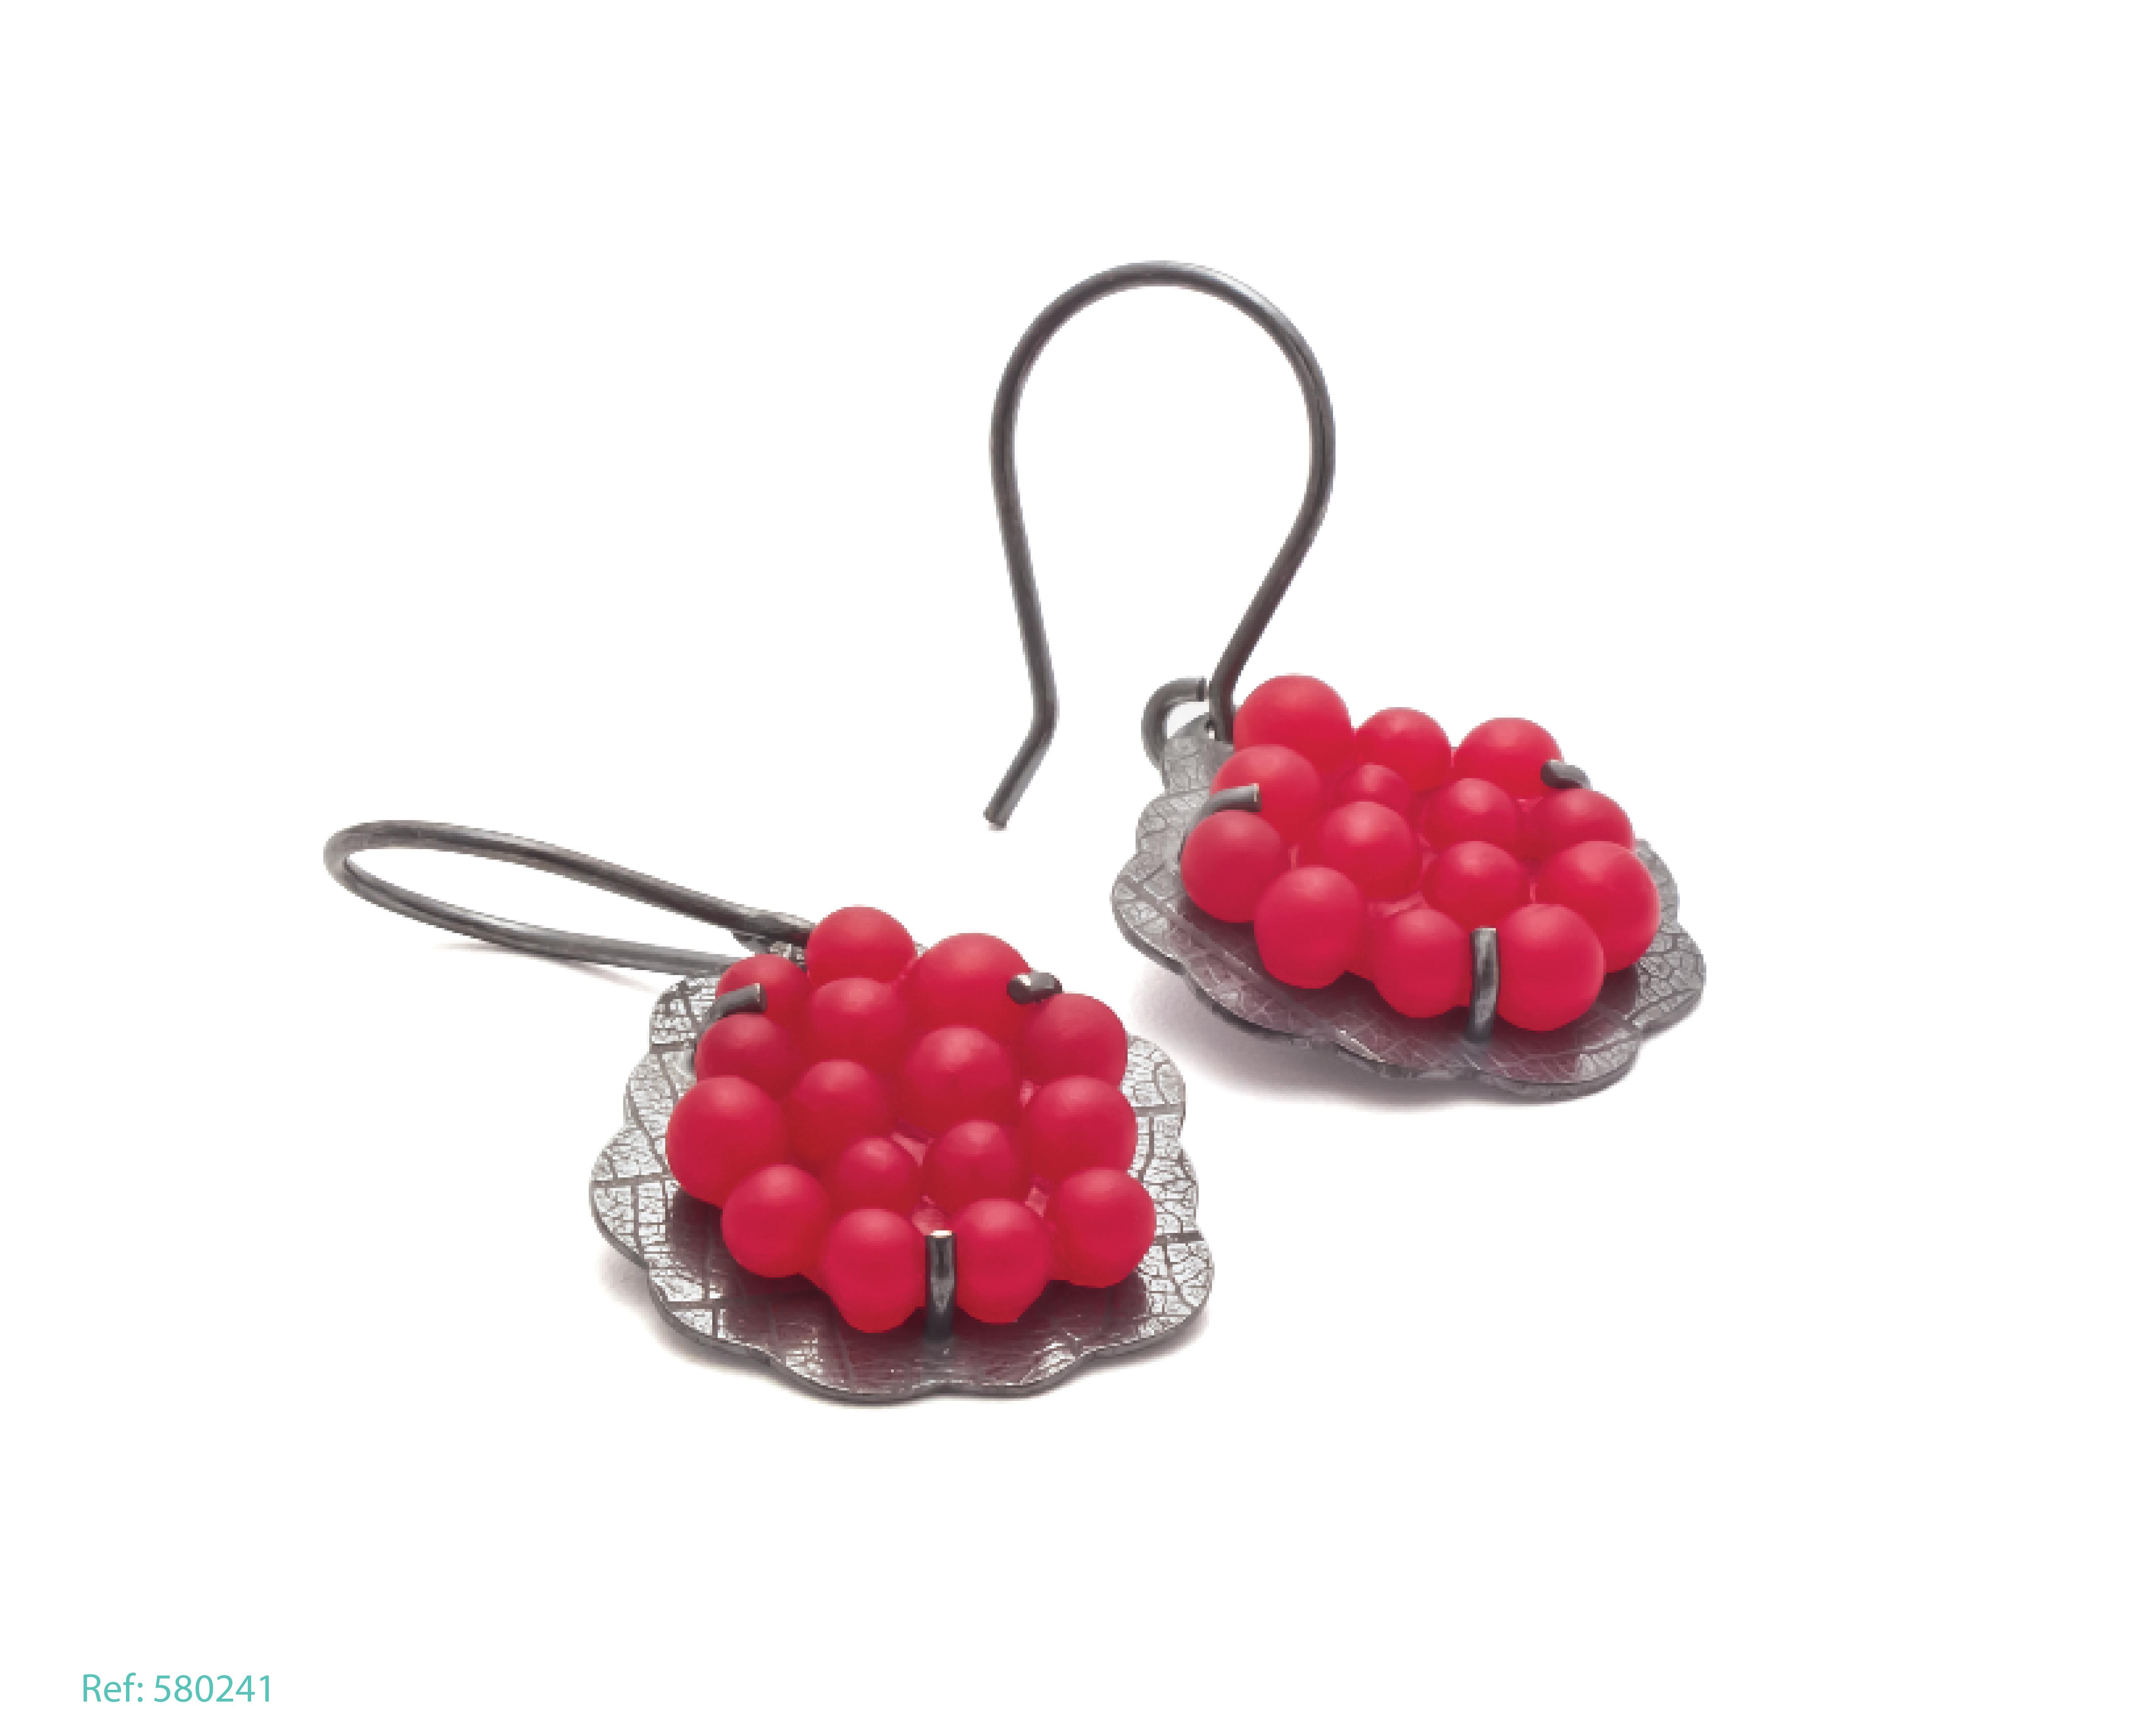 aretes pomegranate ref 580241